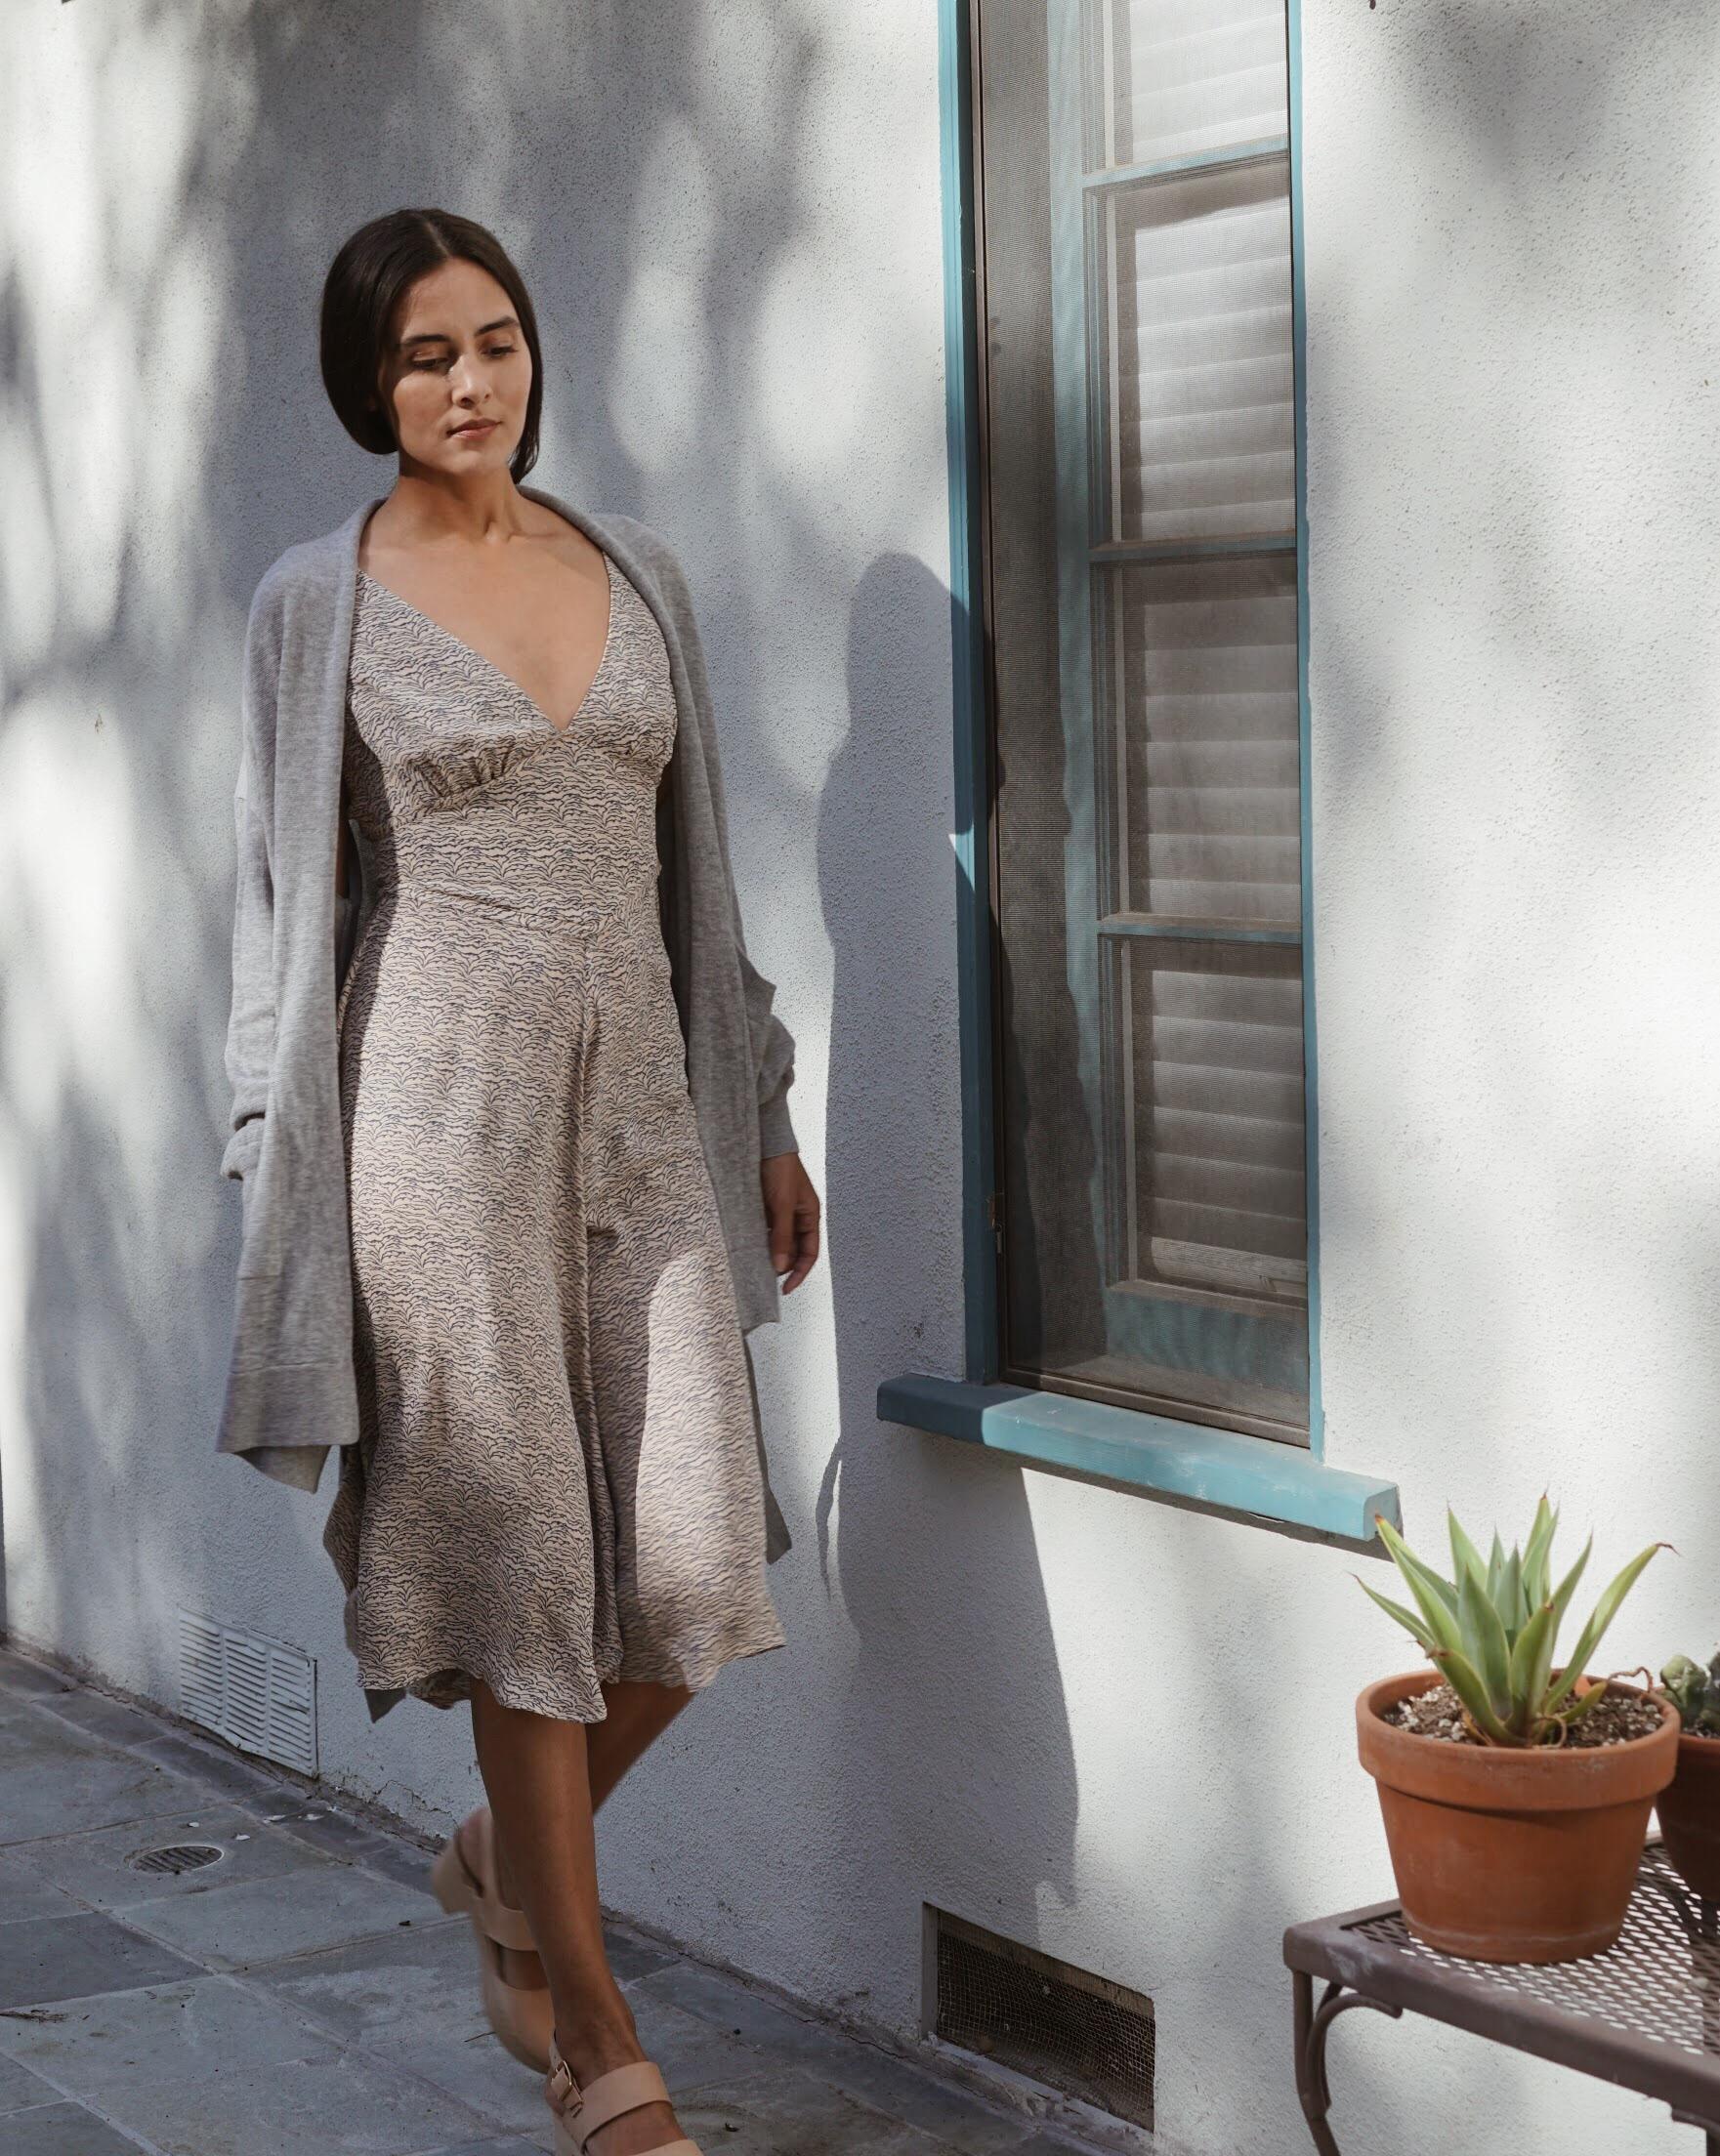 Olga Kapustina Silk Georgette Slip dress in Print +  Maiyet  Wrap Cardigan in Grey +   Zuzii   Closed Toe Clogs in Natural.